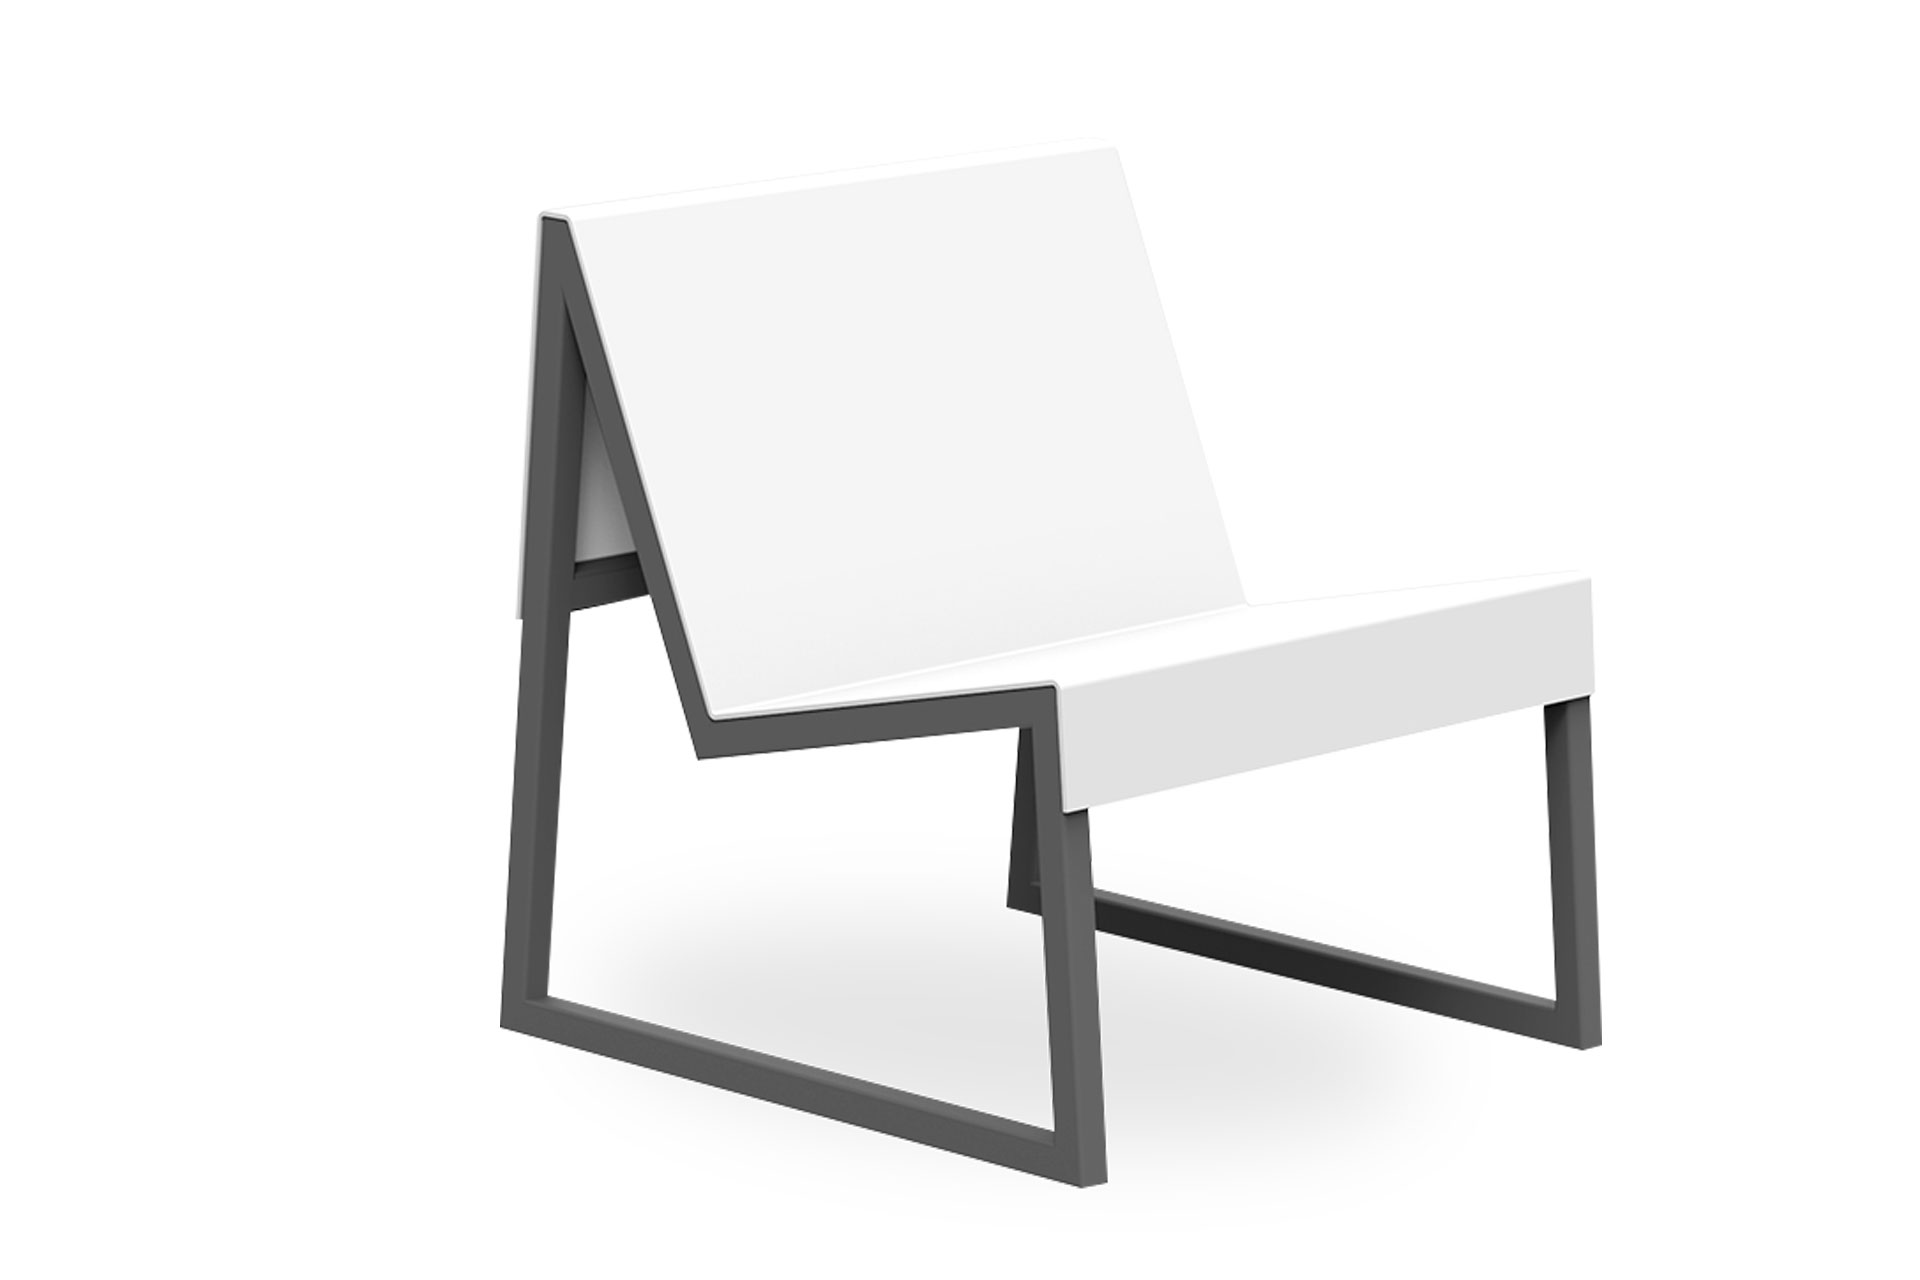 UrbanObjekts Spatule Sitzgelegenheit